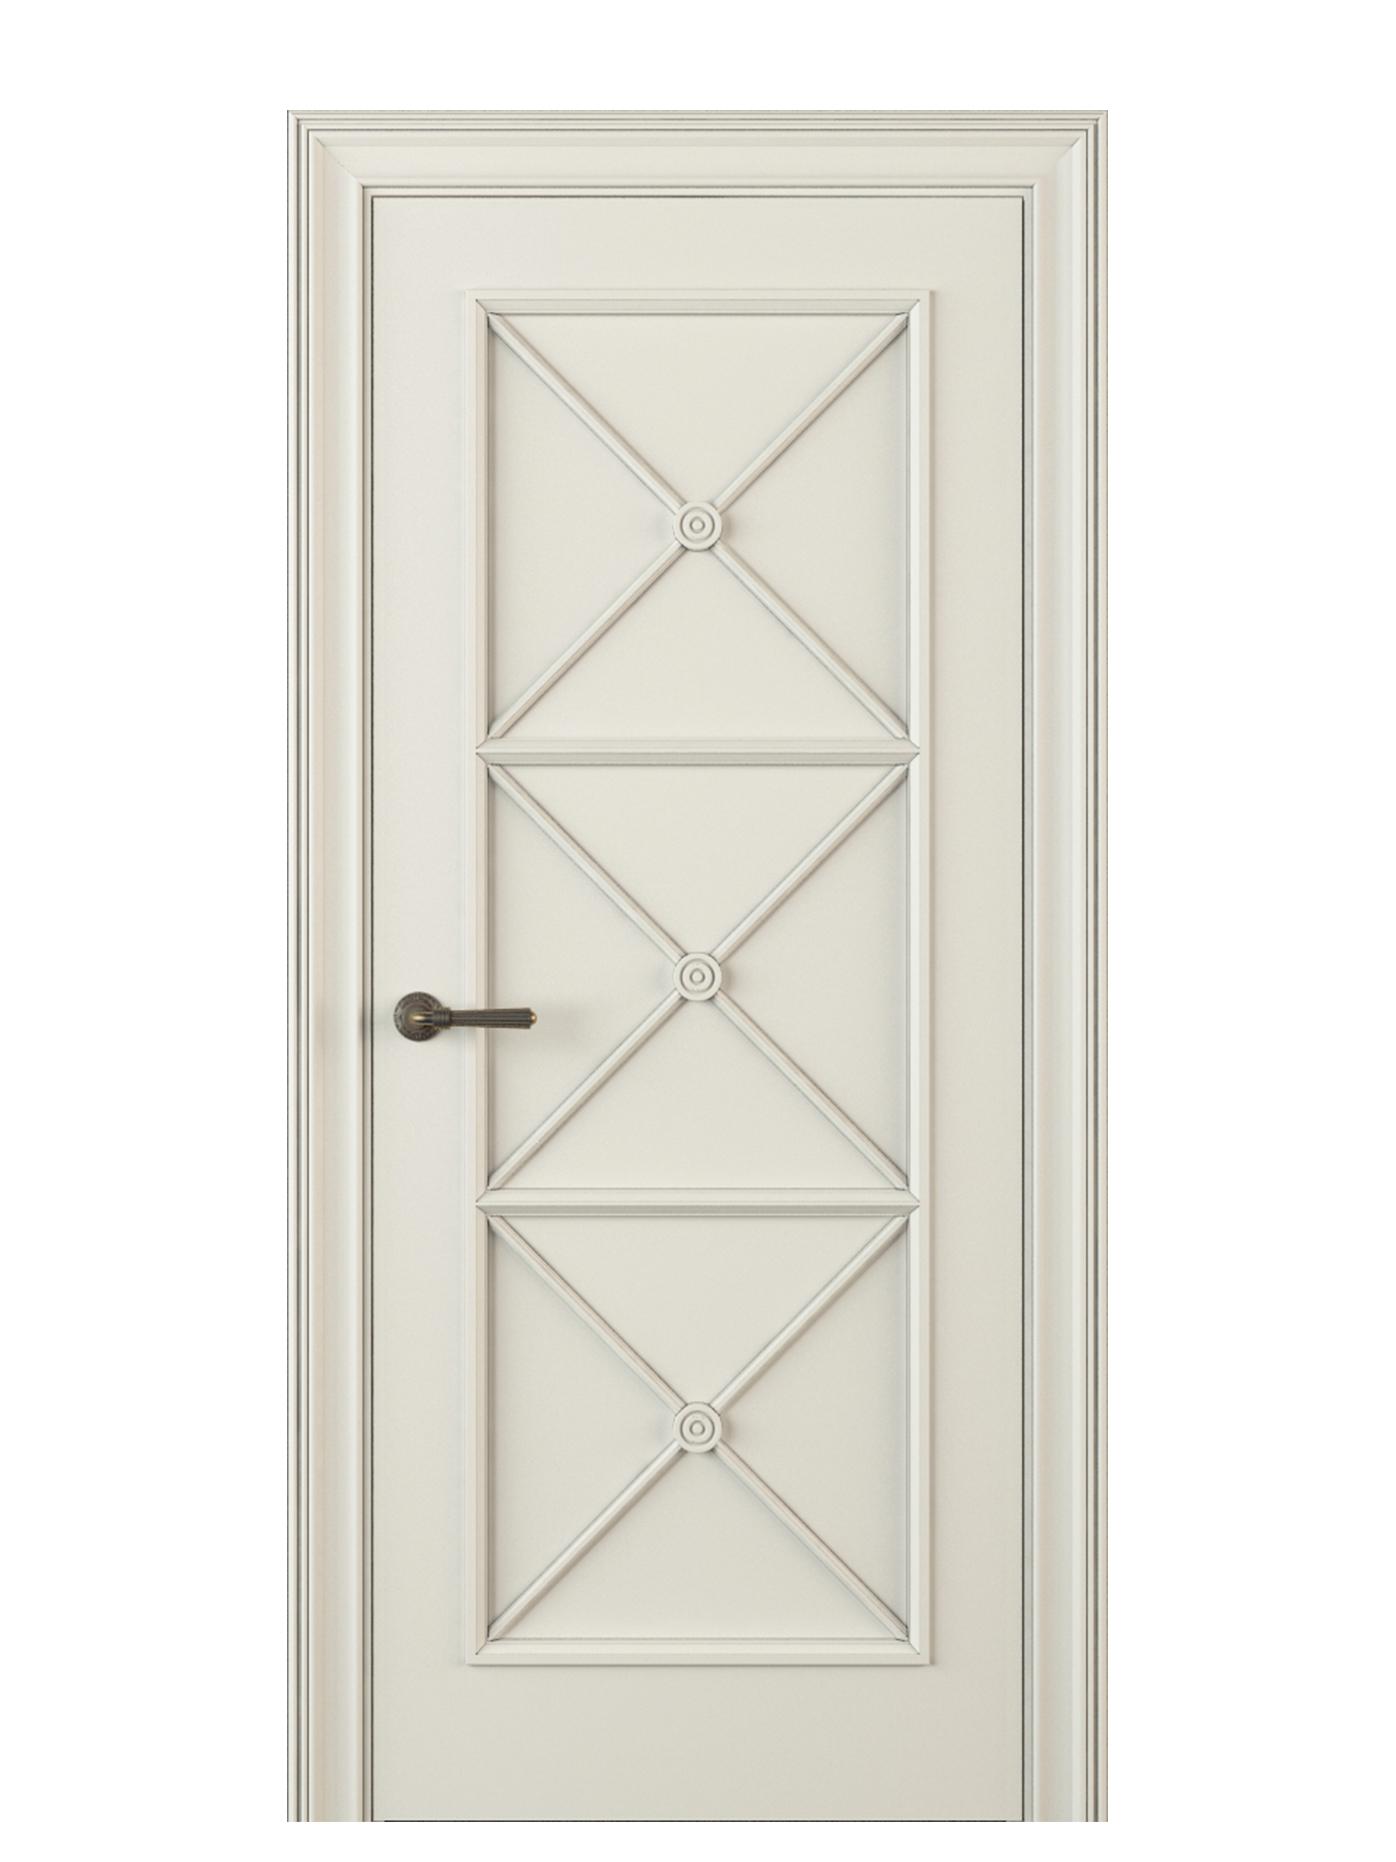 Image Levata Interior Door Italian Enamel 9010 0